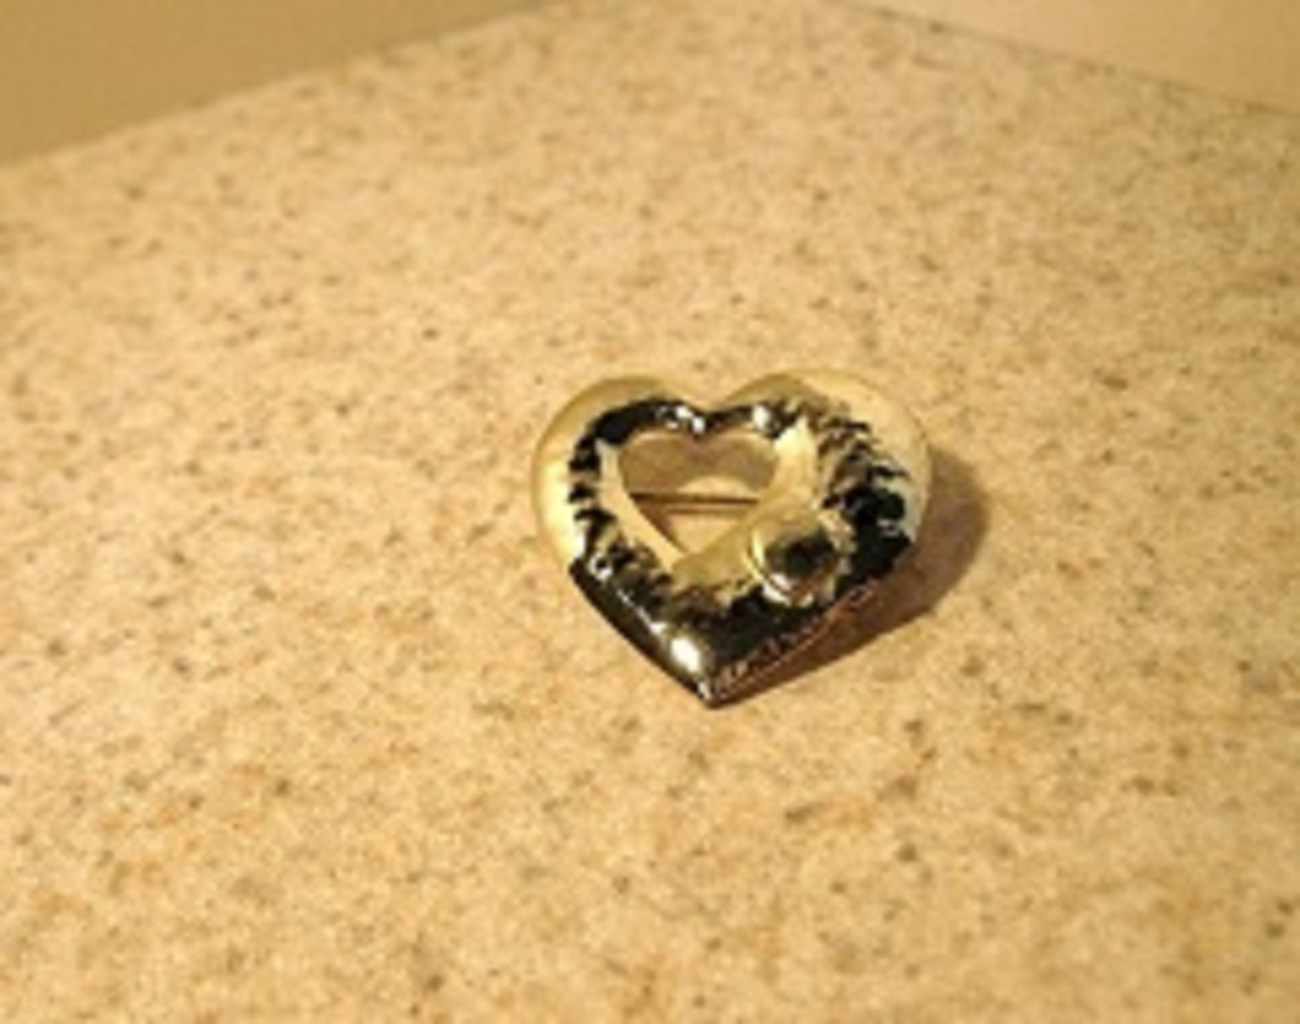 T109 heart shape pin